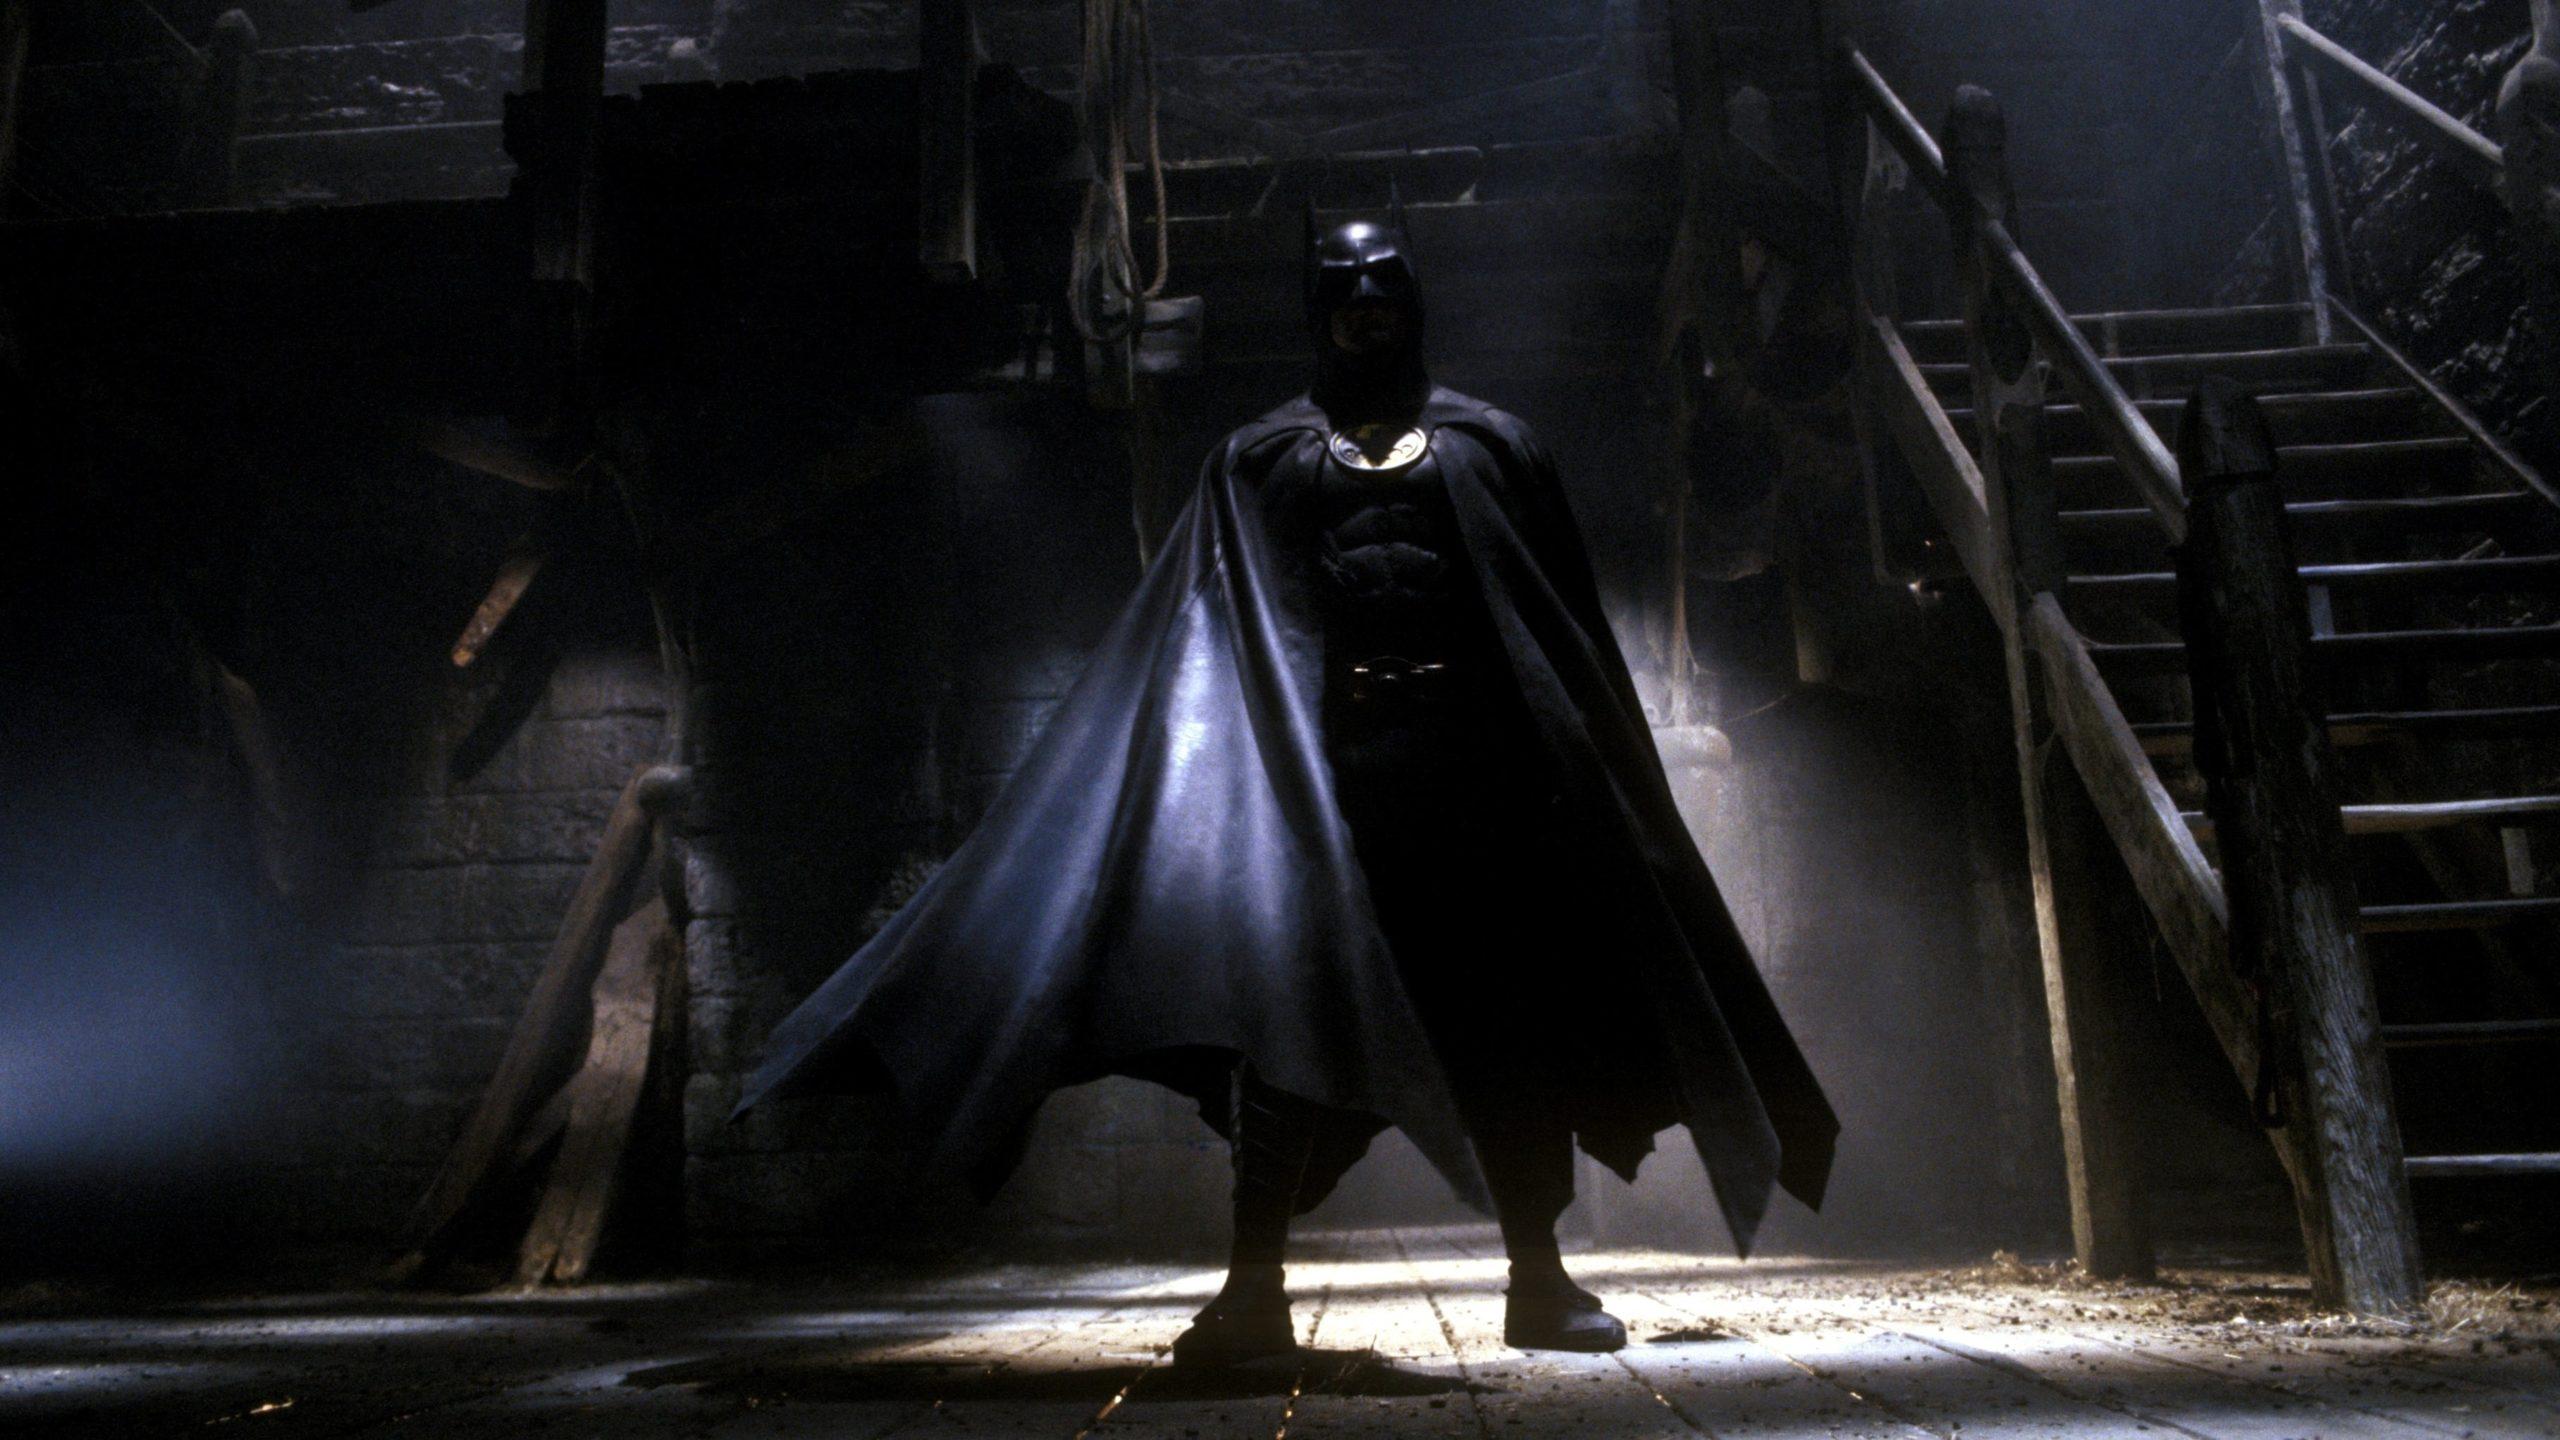 Batman backdrop